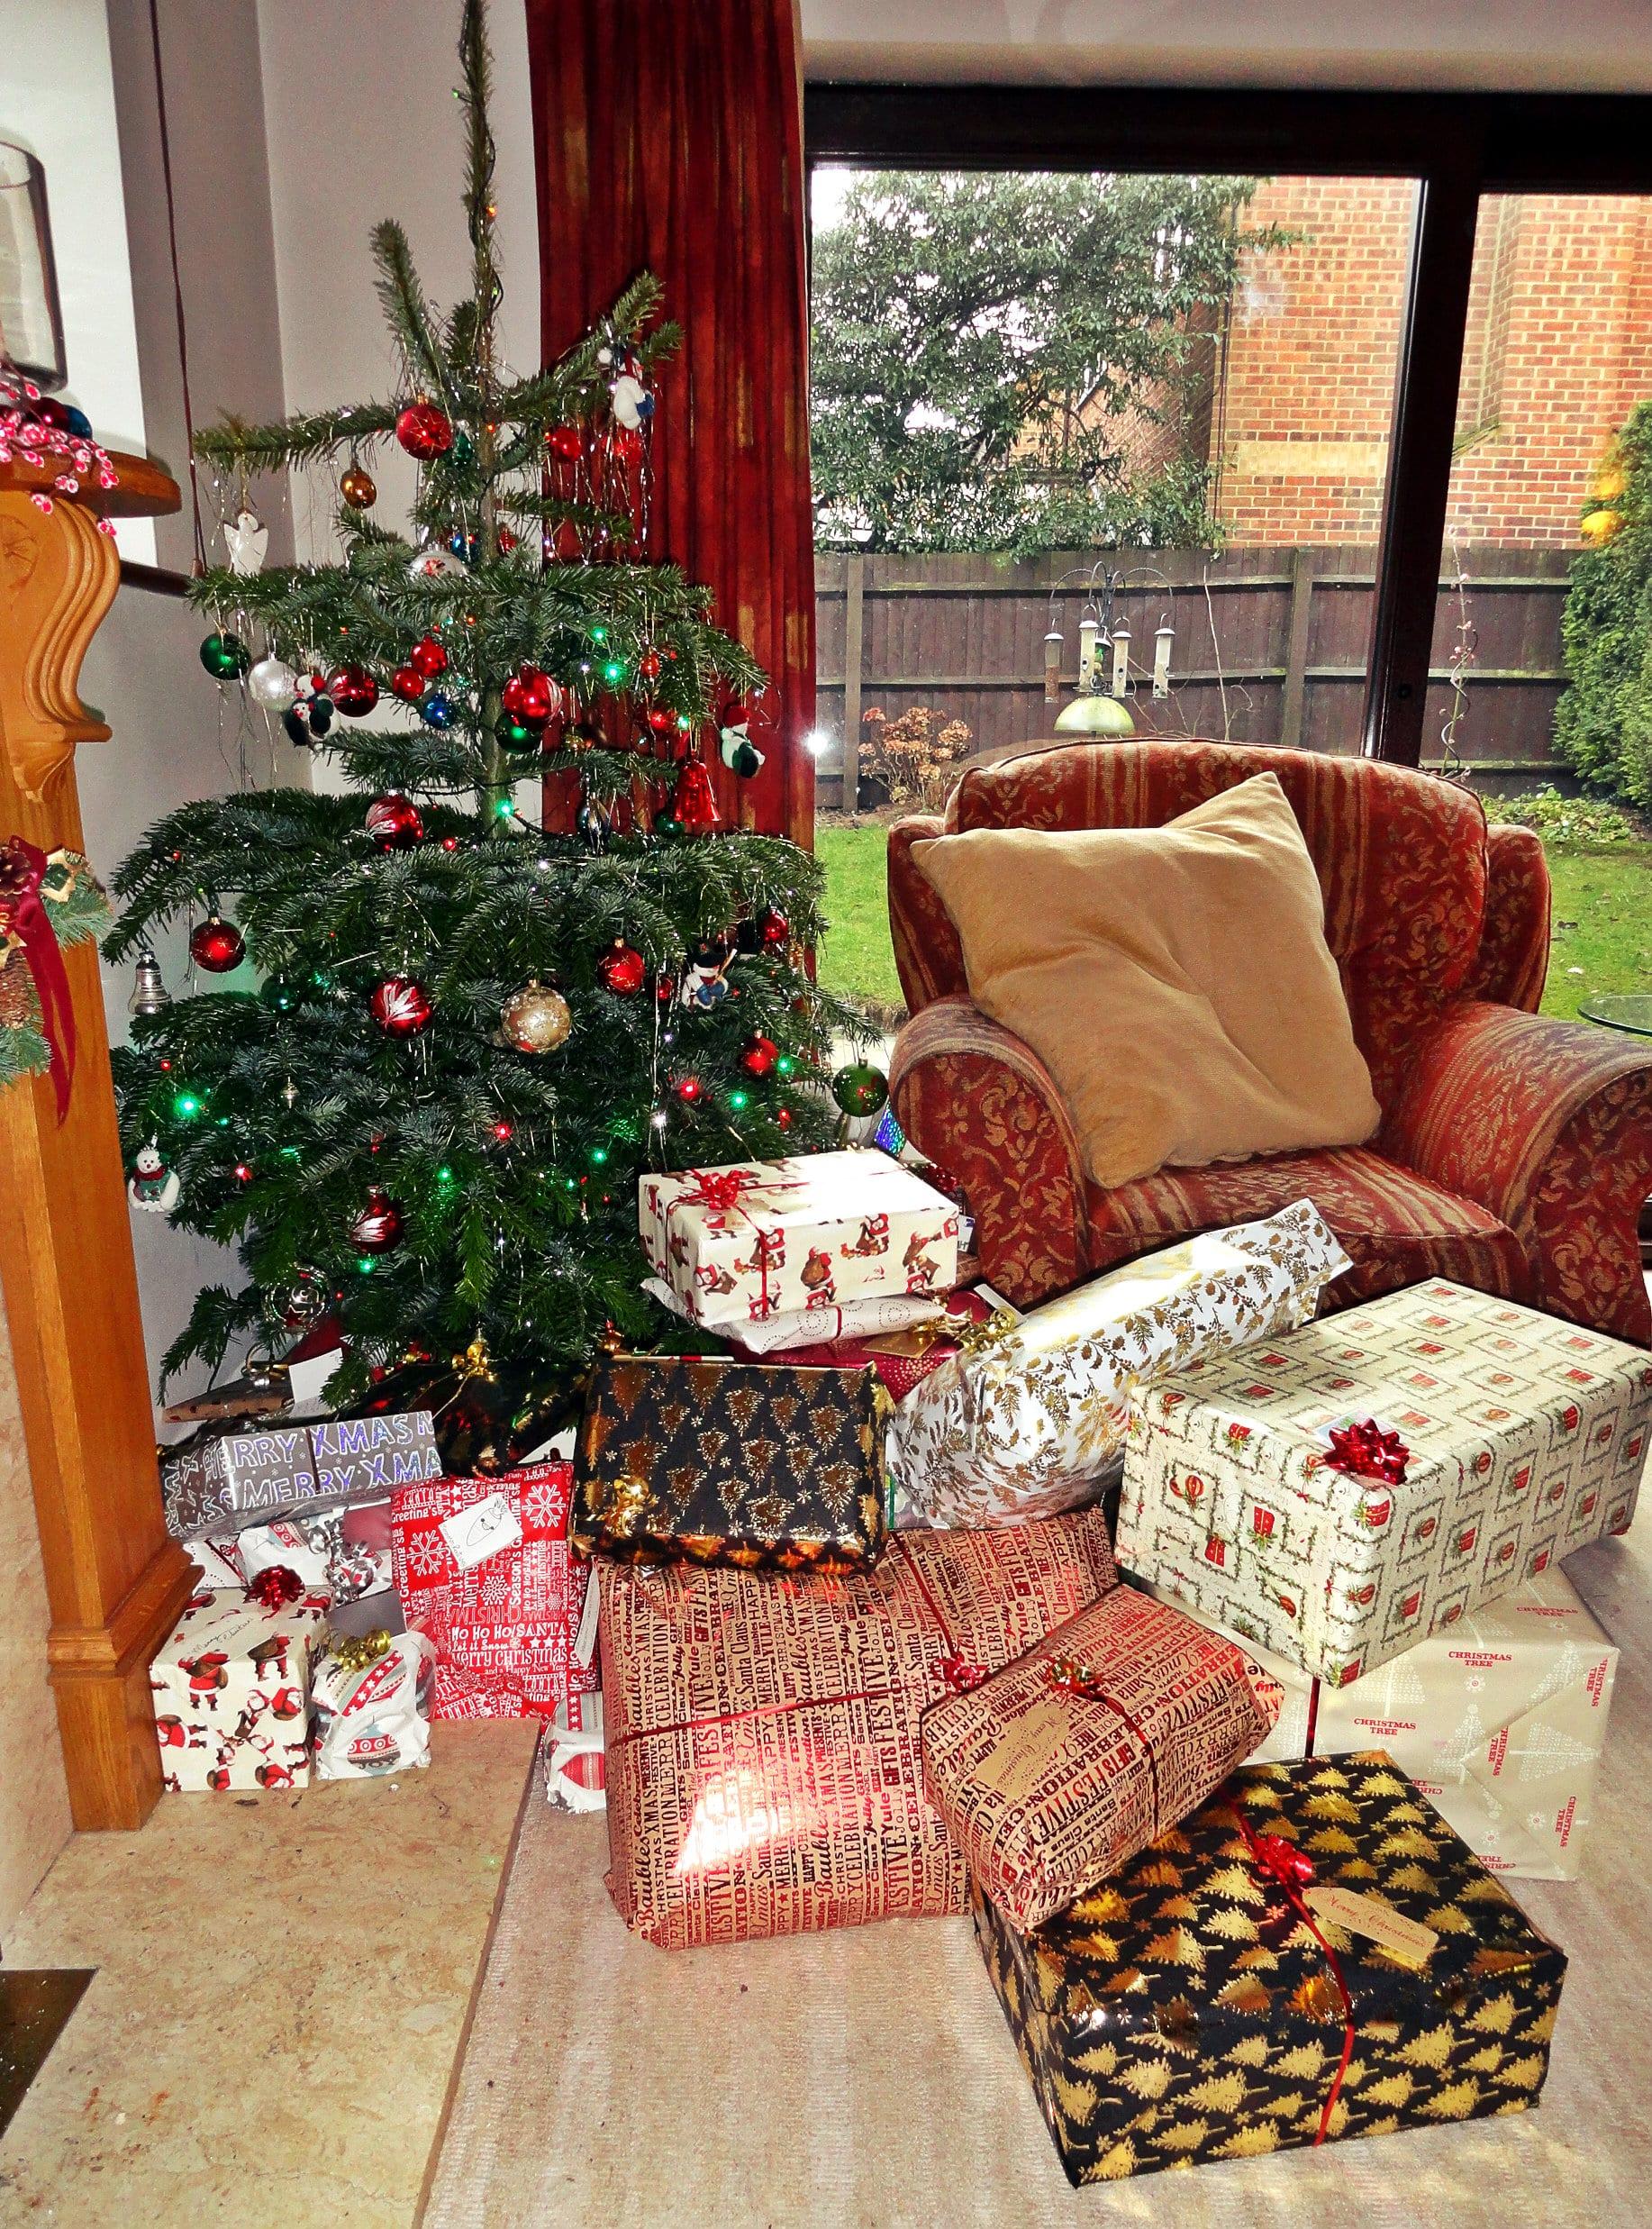 Christmas Day presents